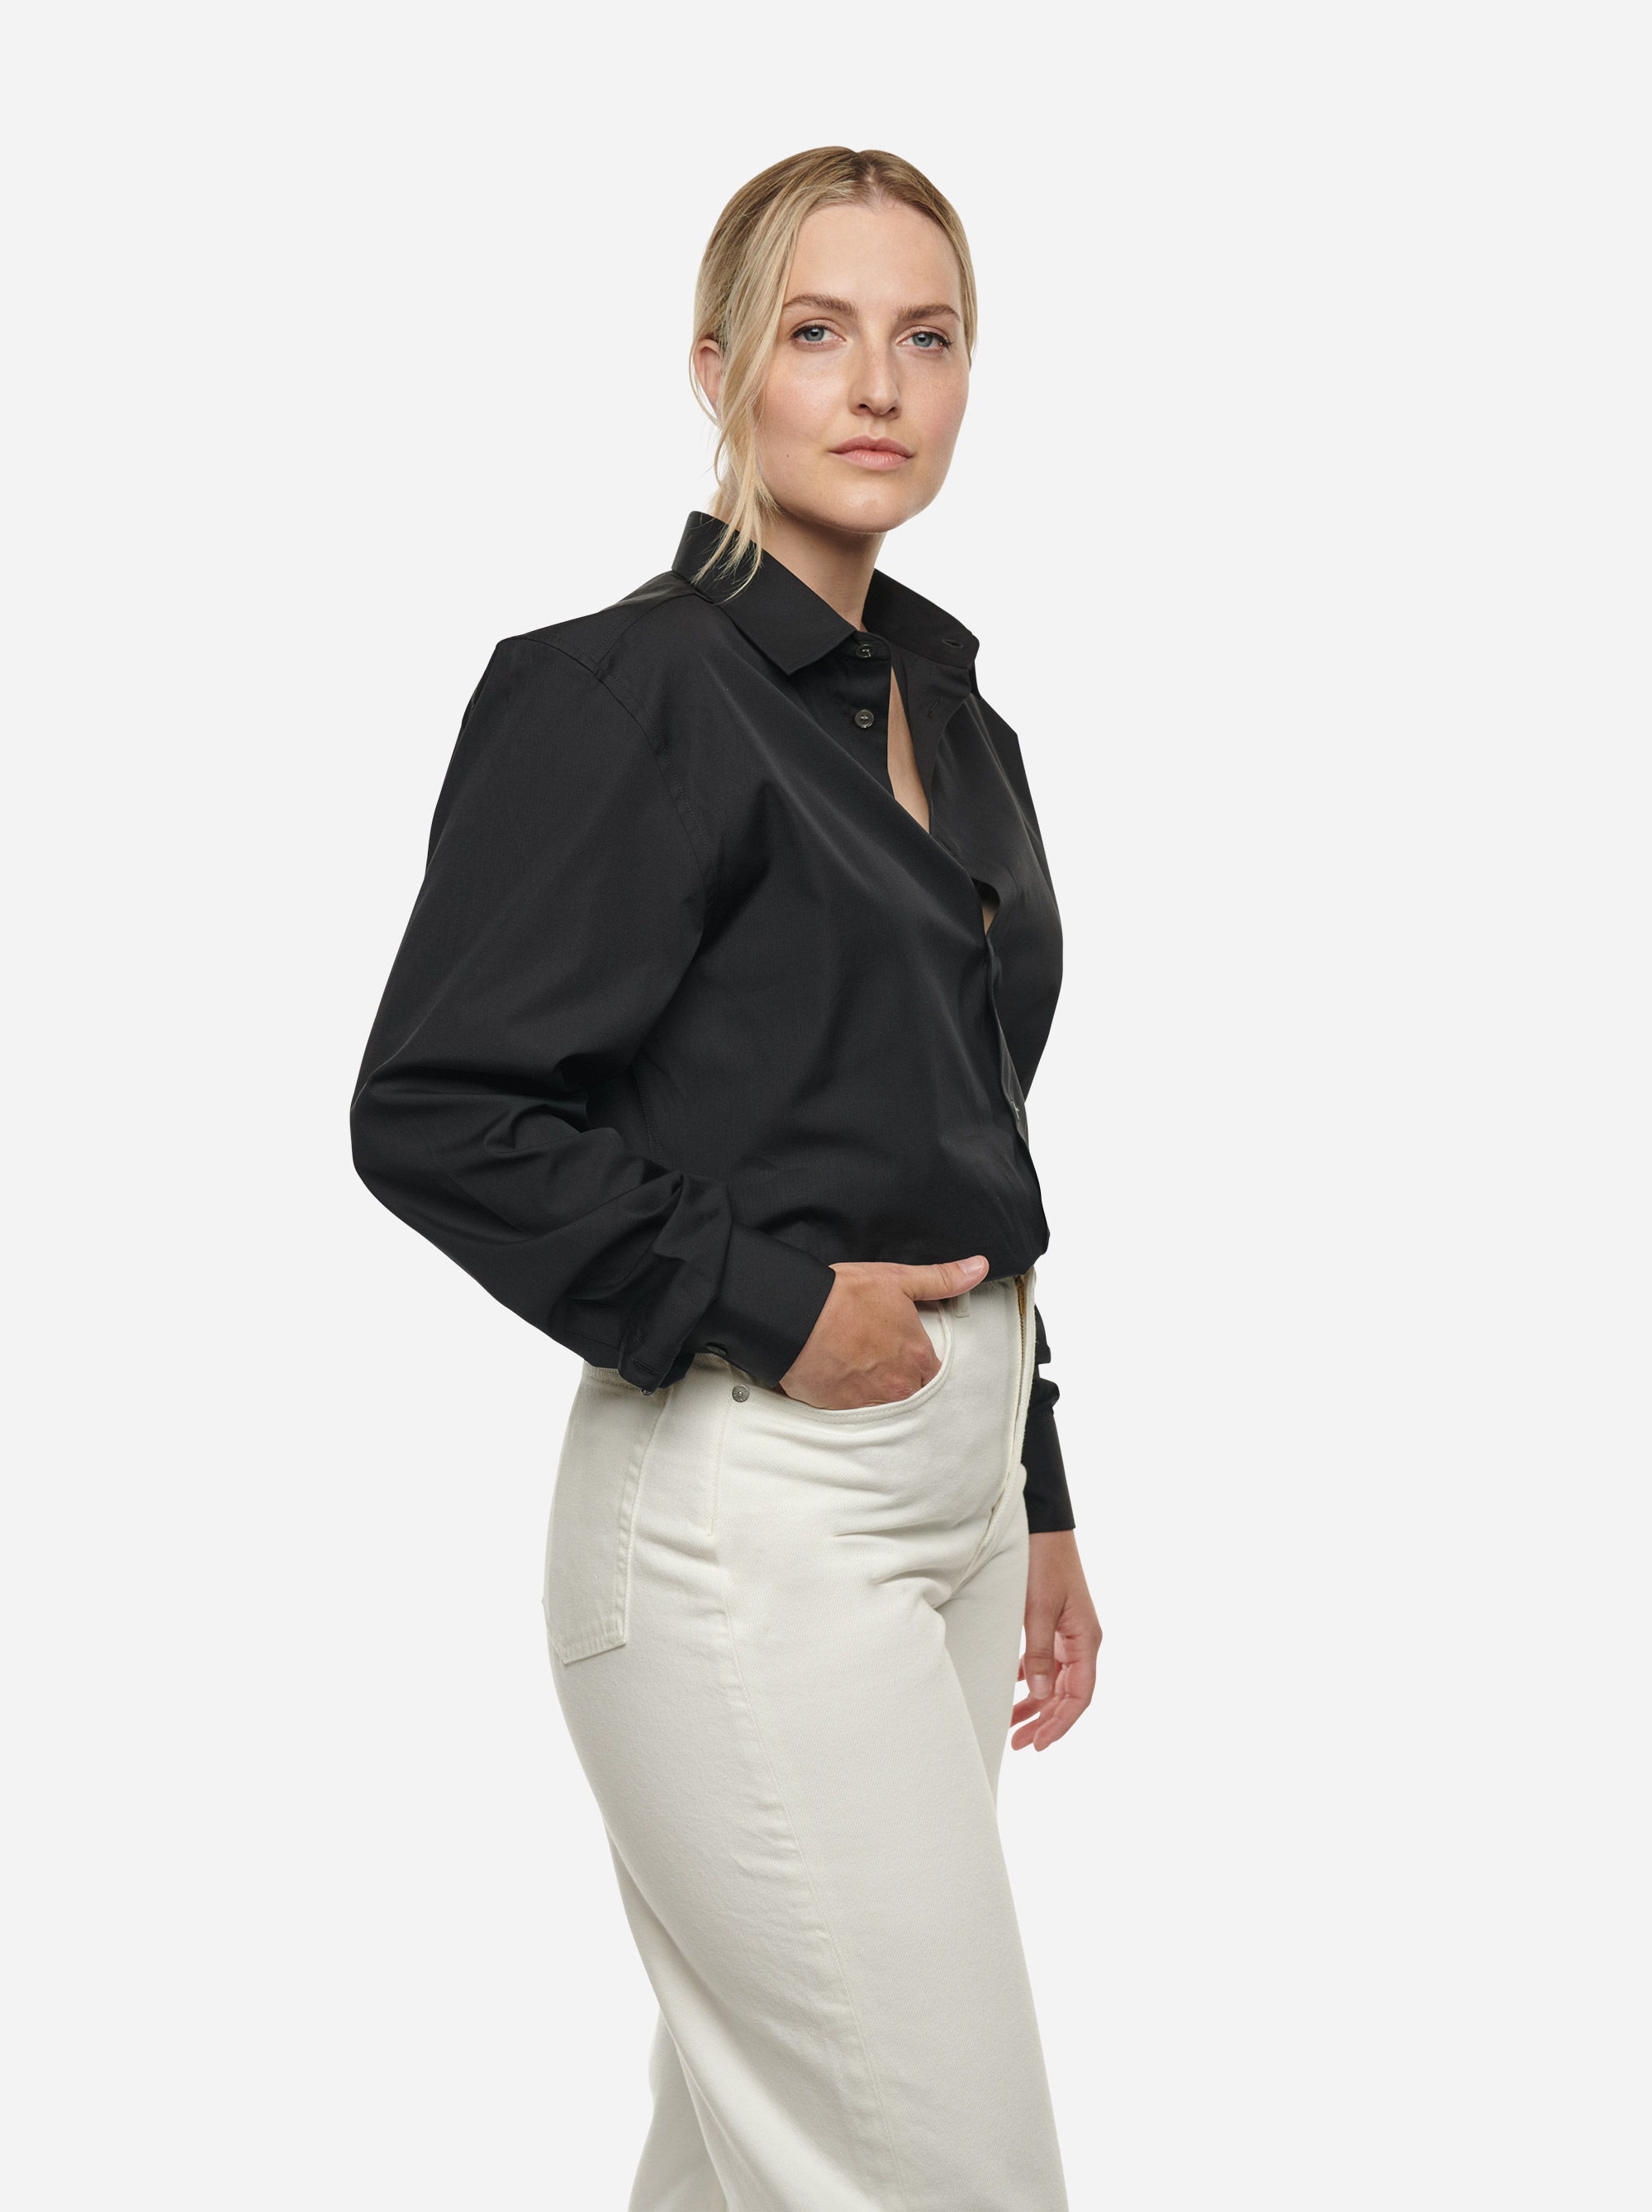 Teym-Shirt-Black-women-mens4